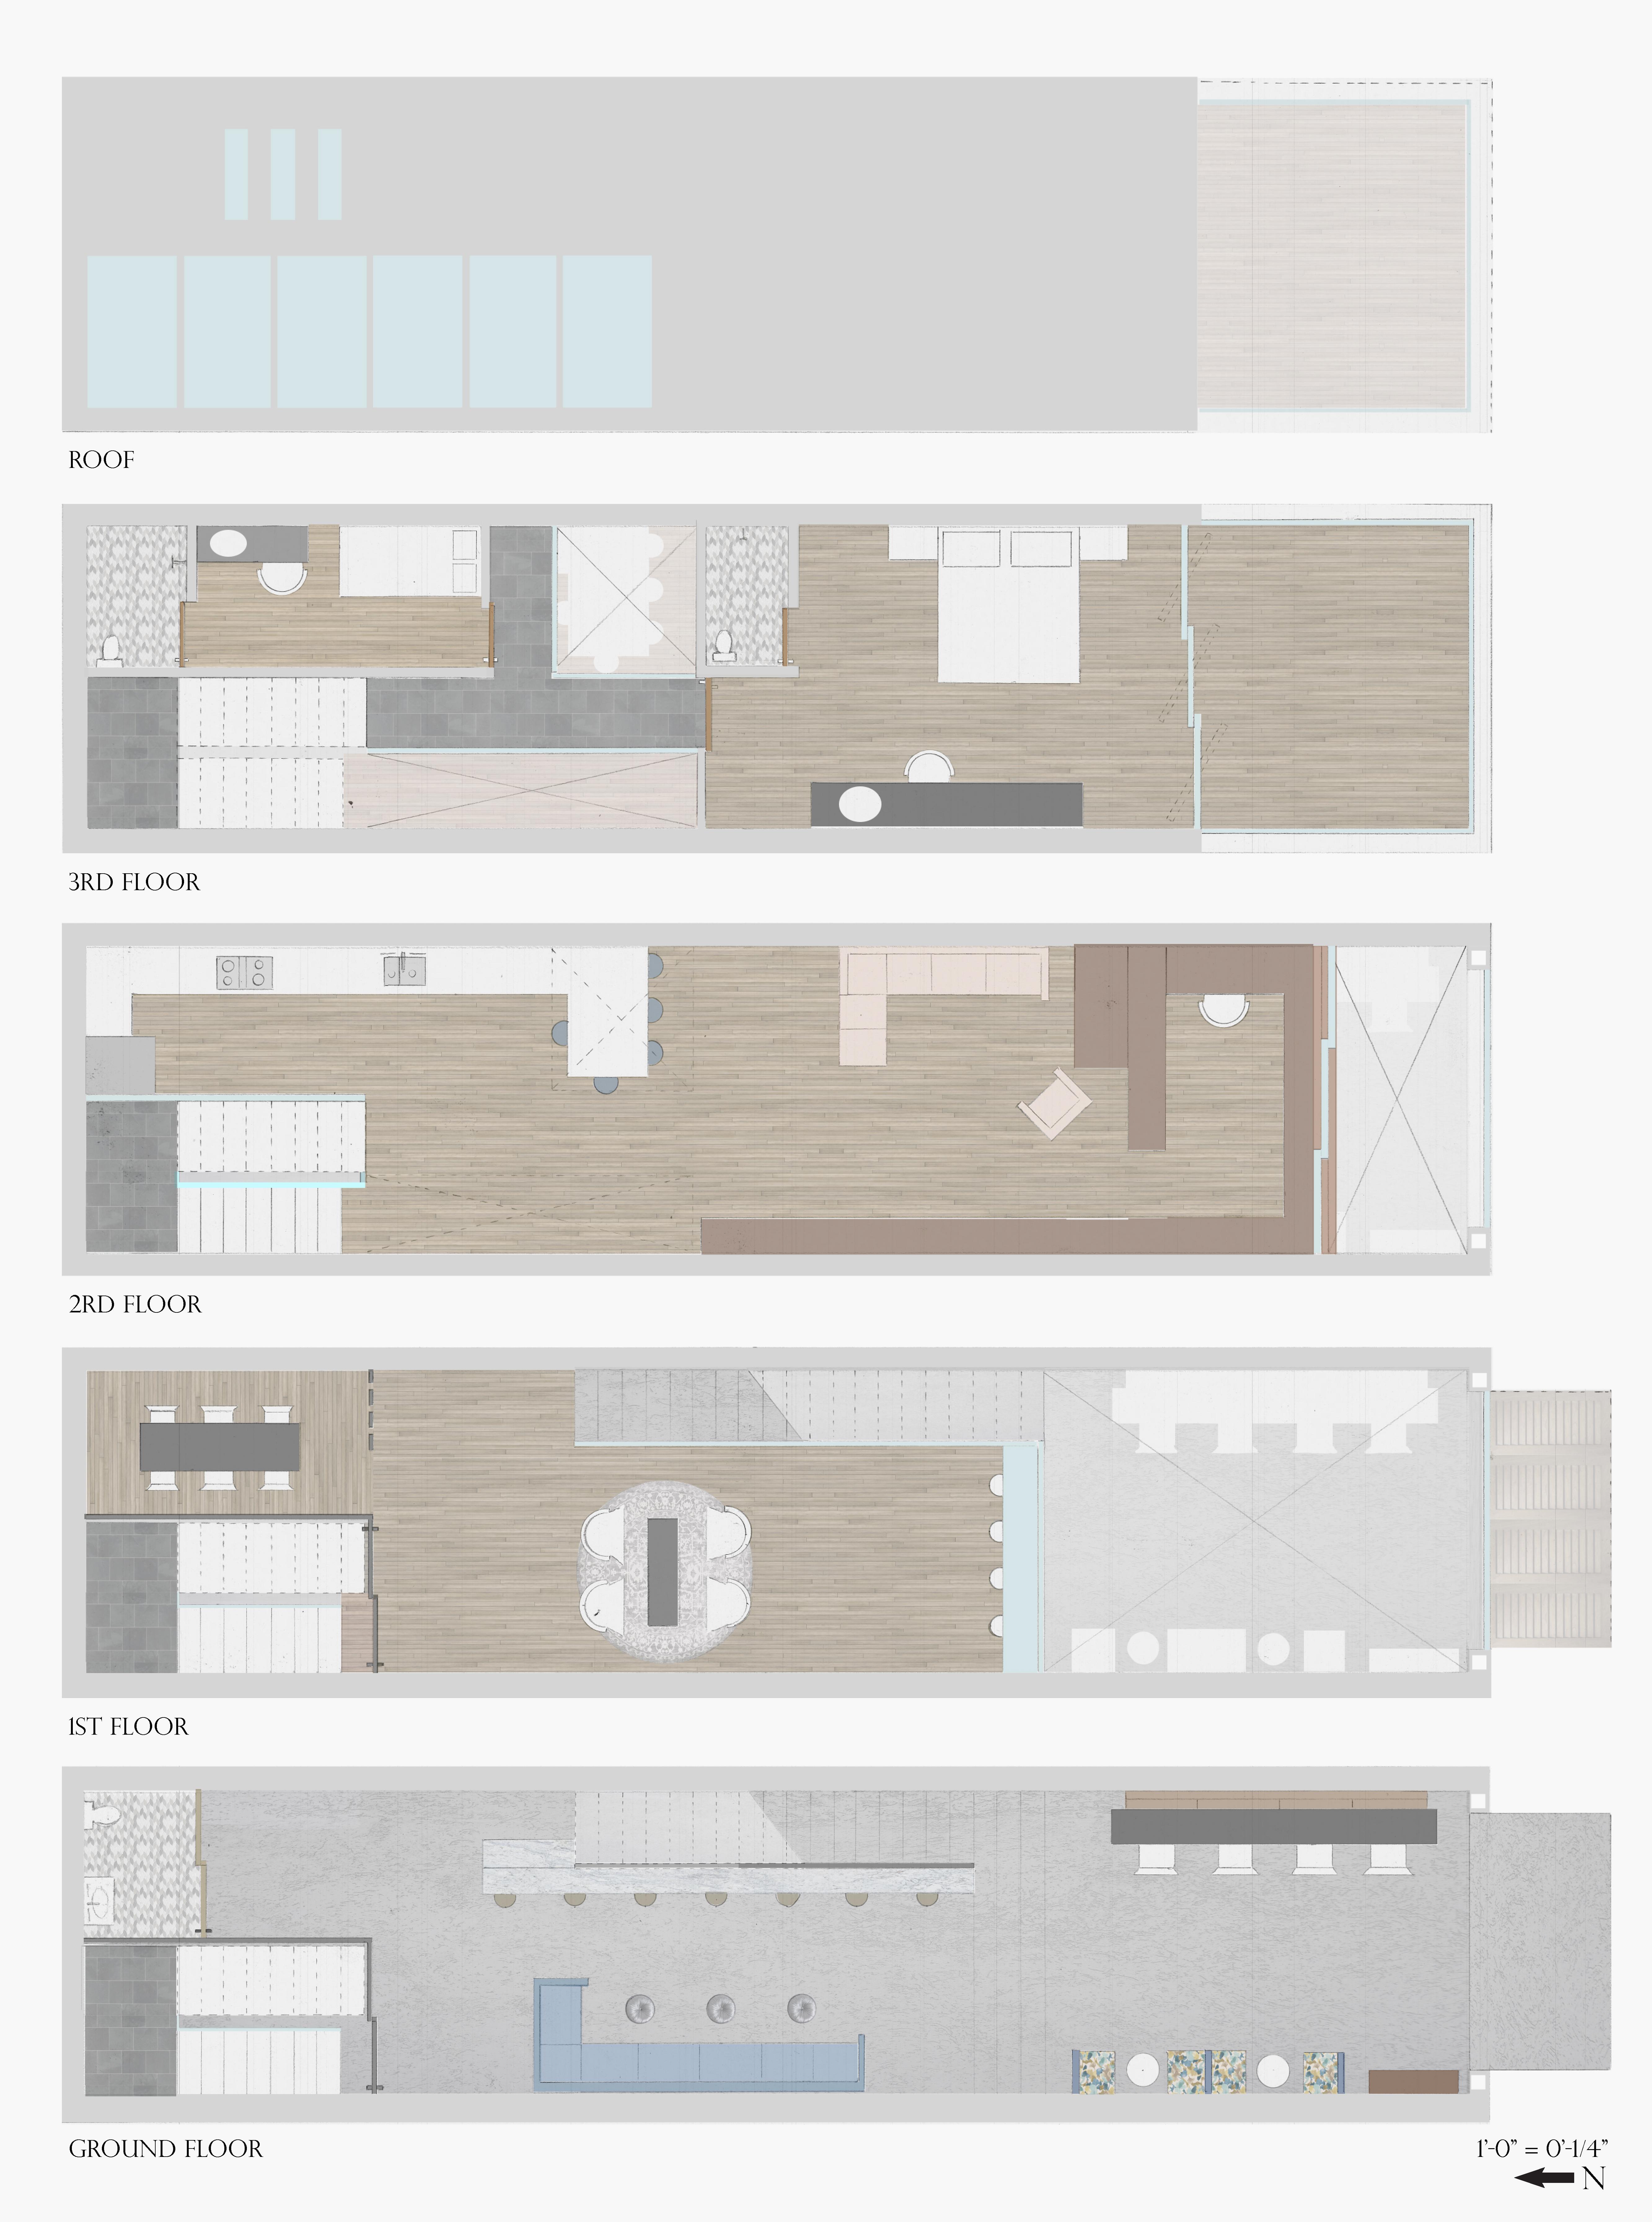 Ho Chi Minh Townhouse Floorplan